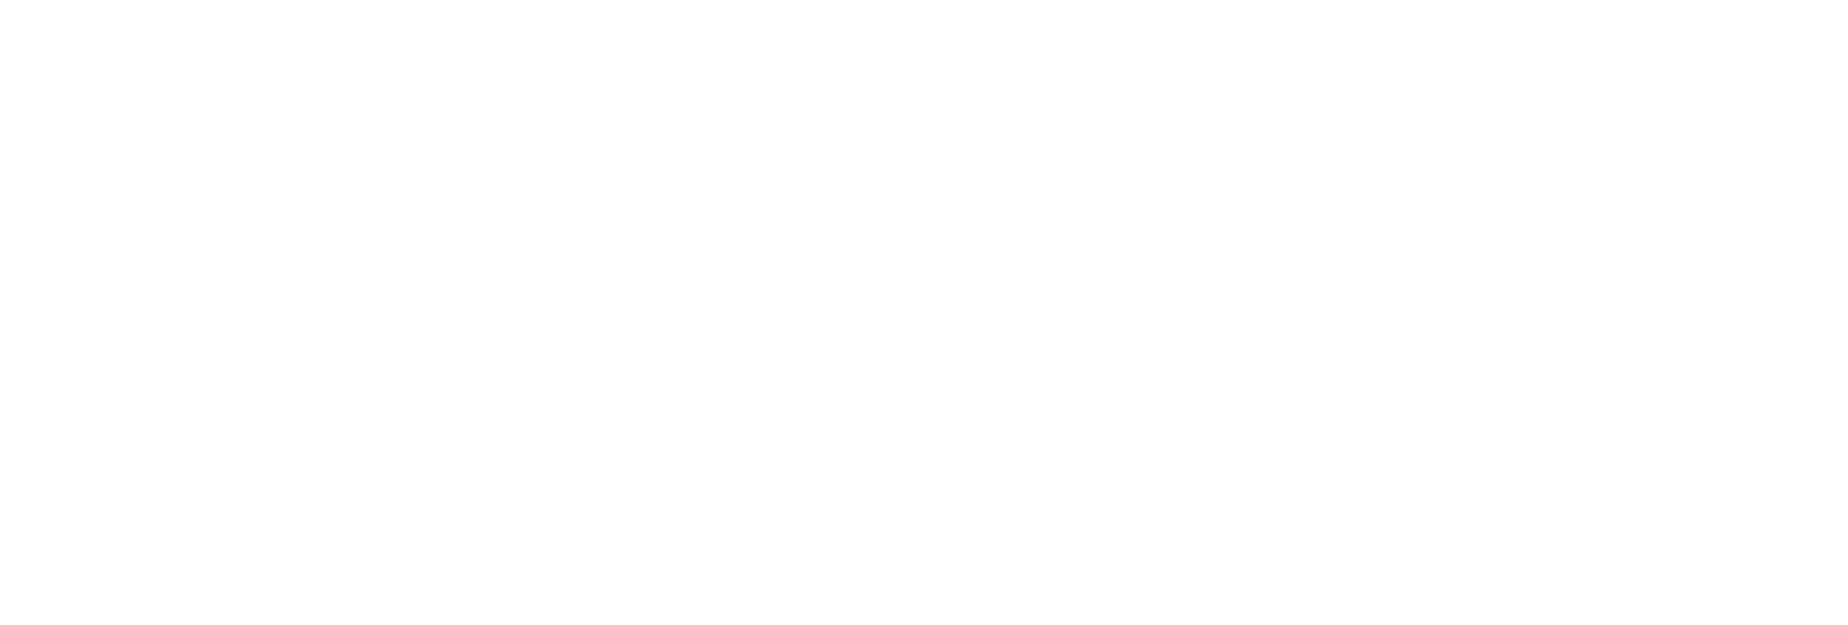 Aldac